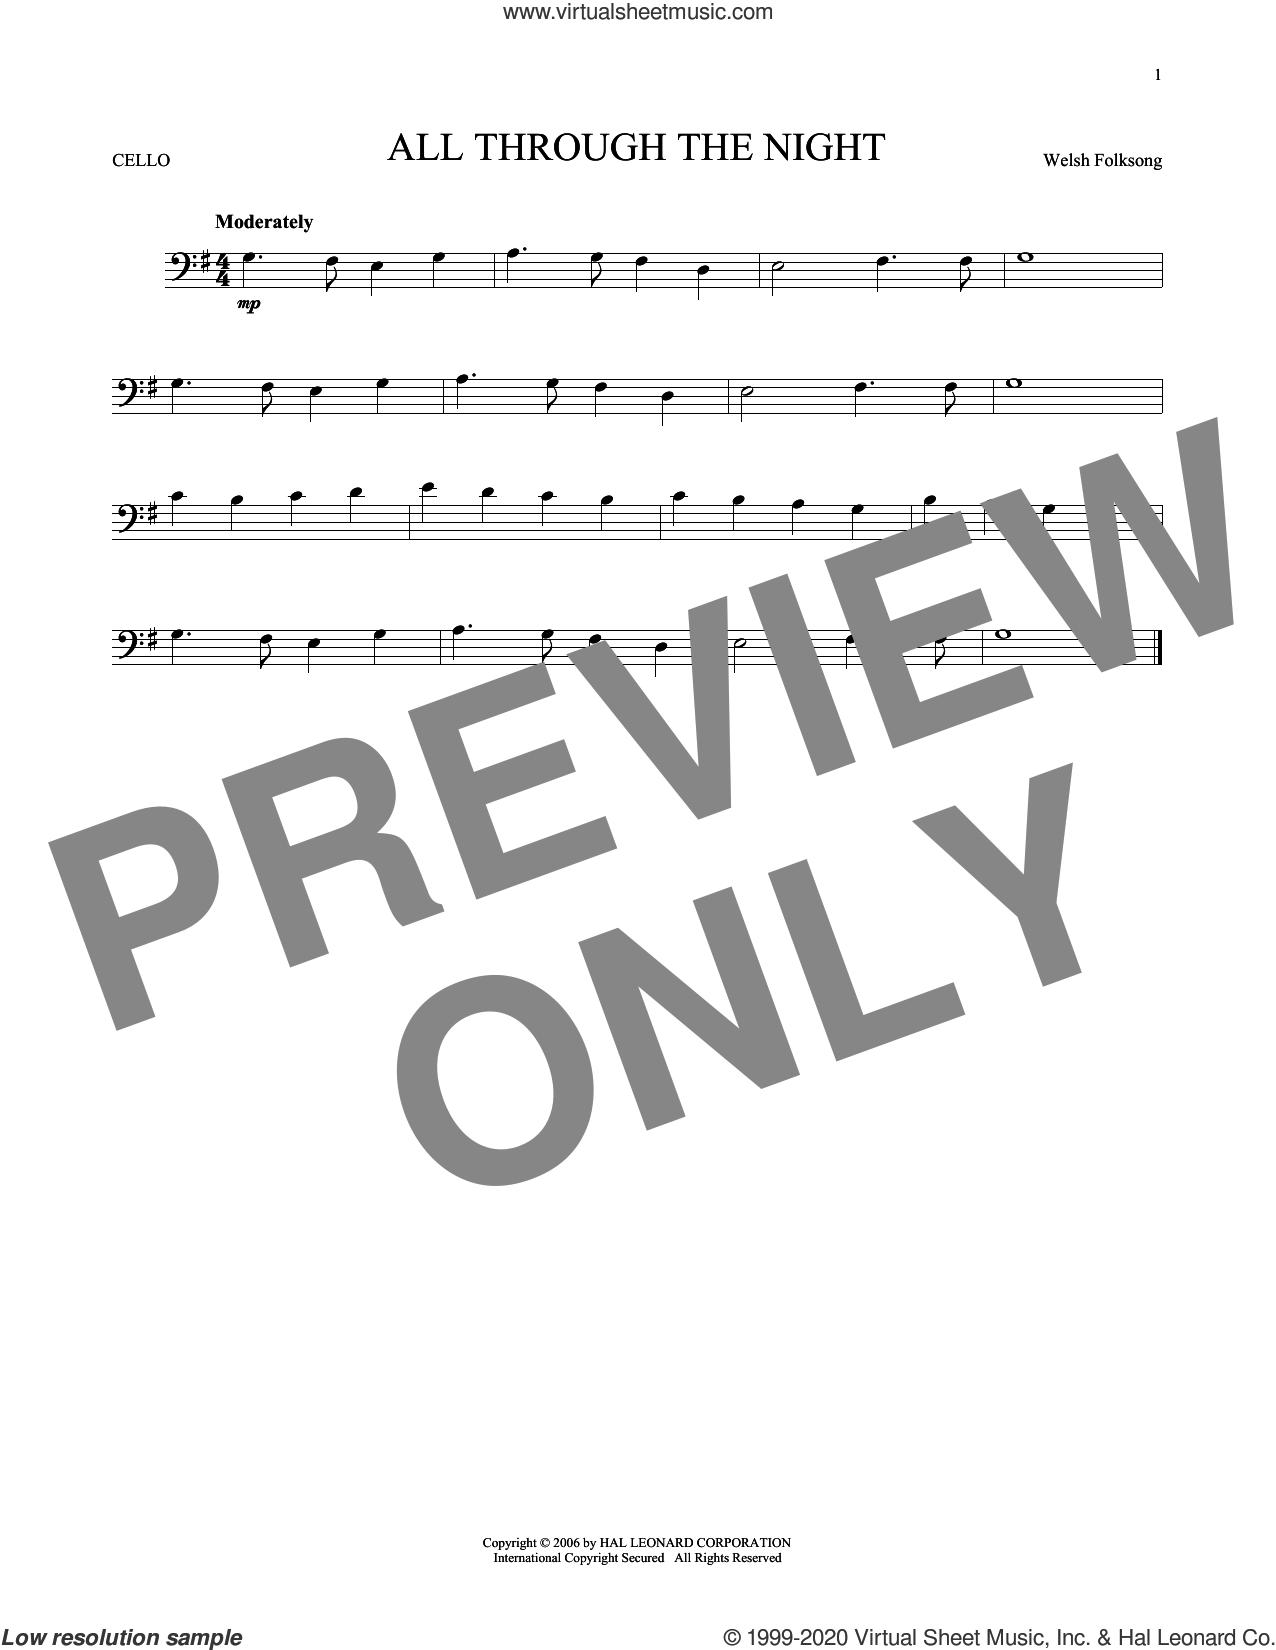 All Through The Night sheet music for cello solo, intermediate skill level